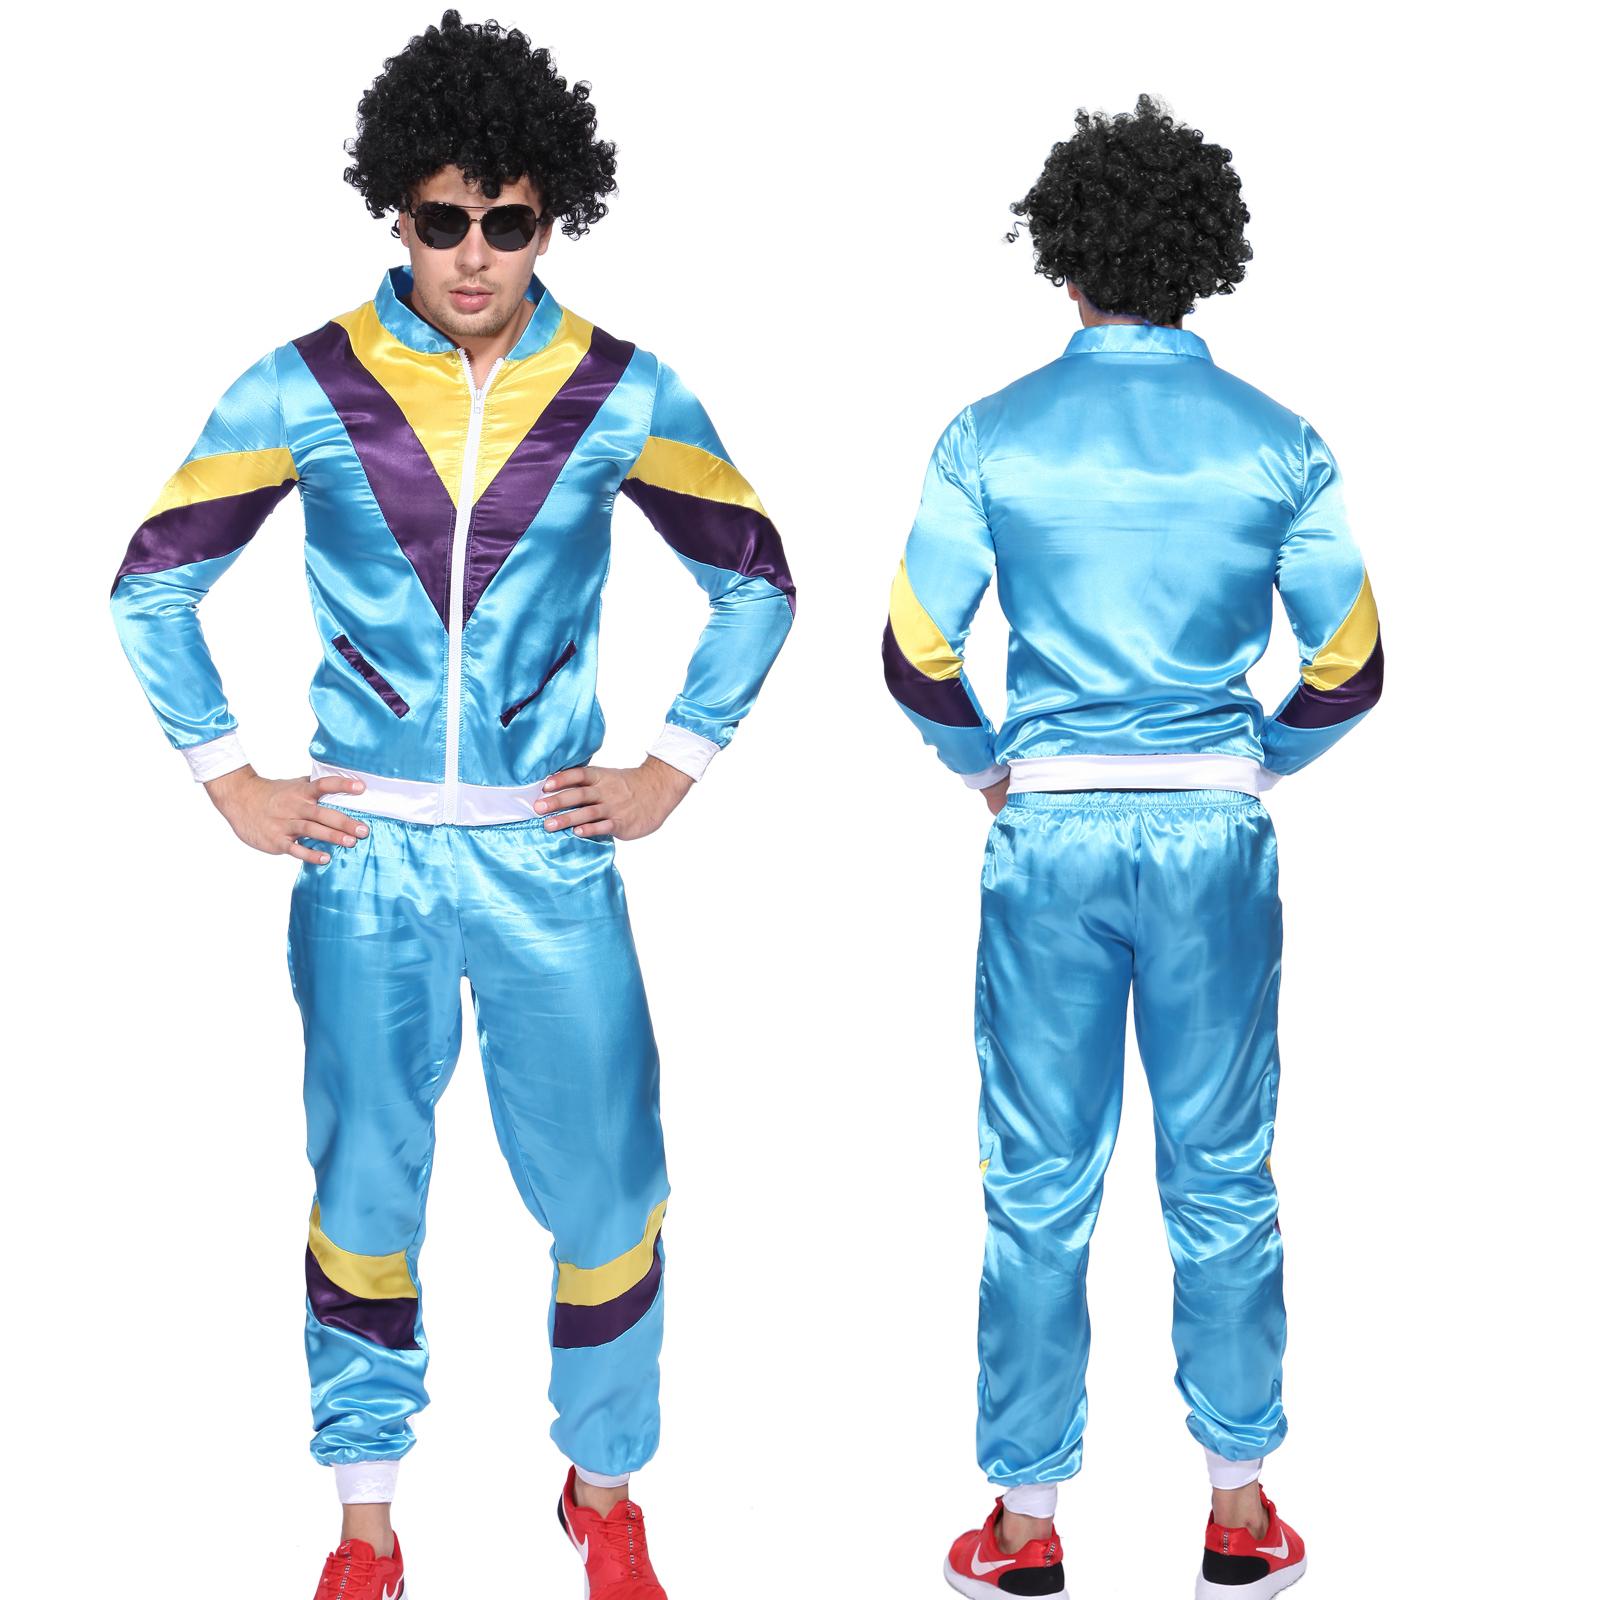 Dress code eighties - Adult 80s Tracksuit Shell Suit Scouser 1980s Womens Mens Fancy Dress Costume